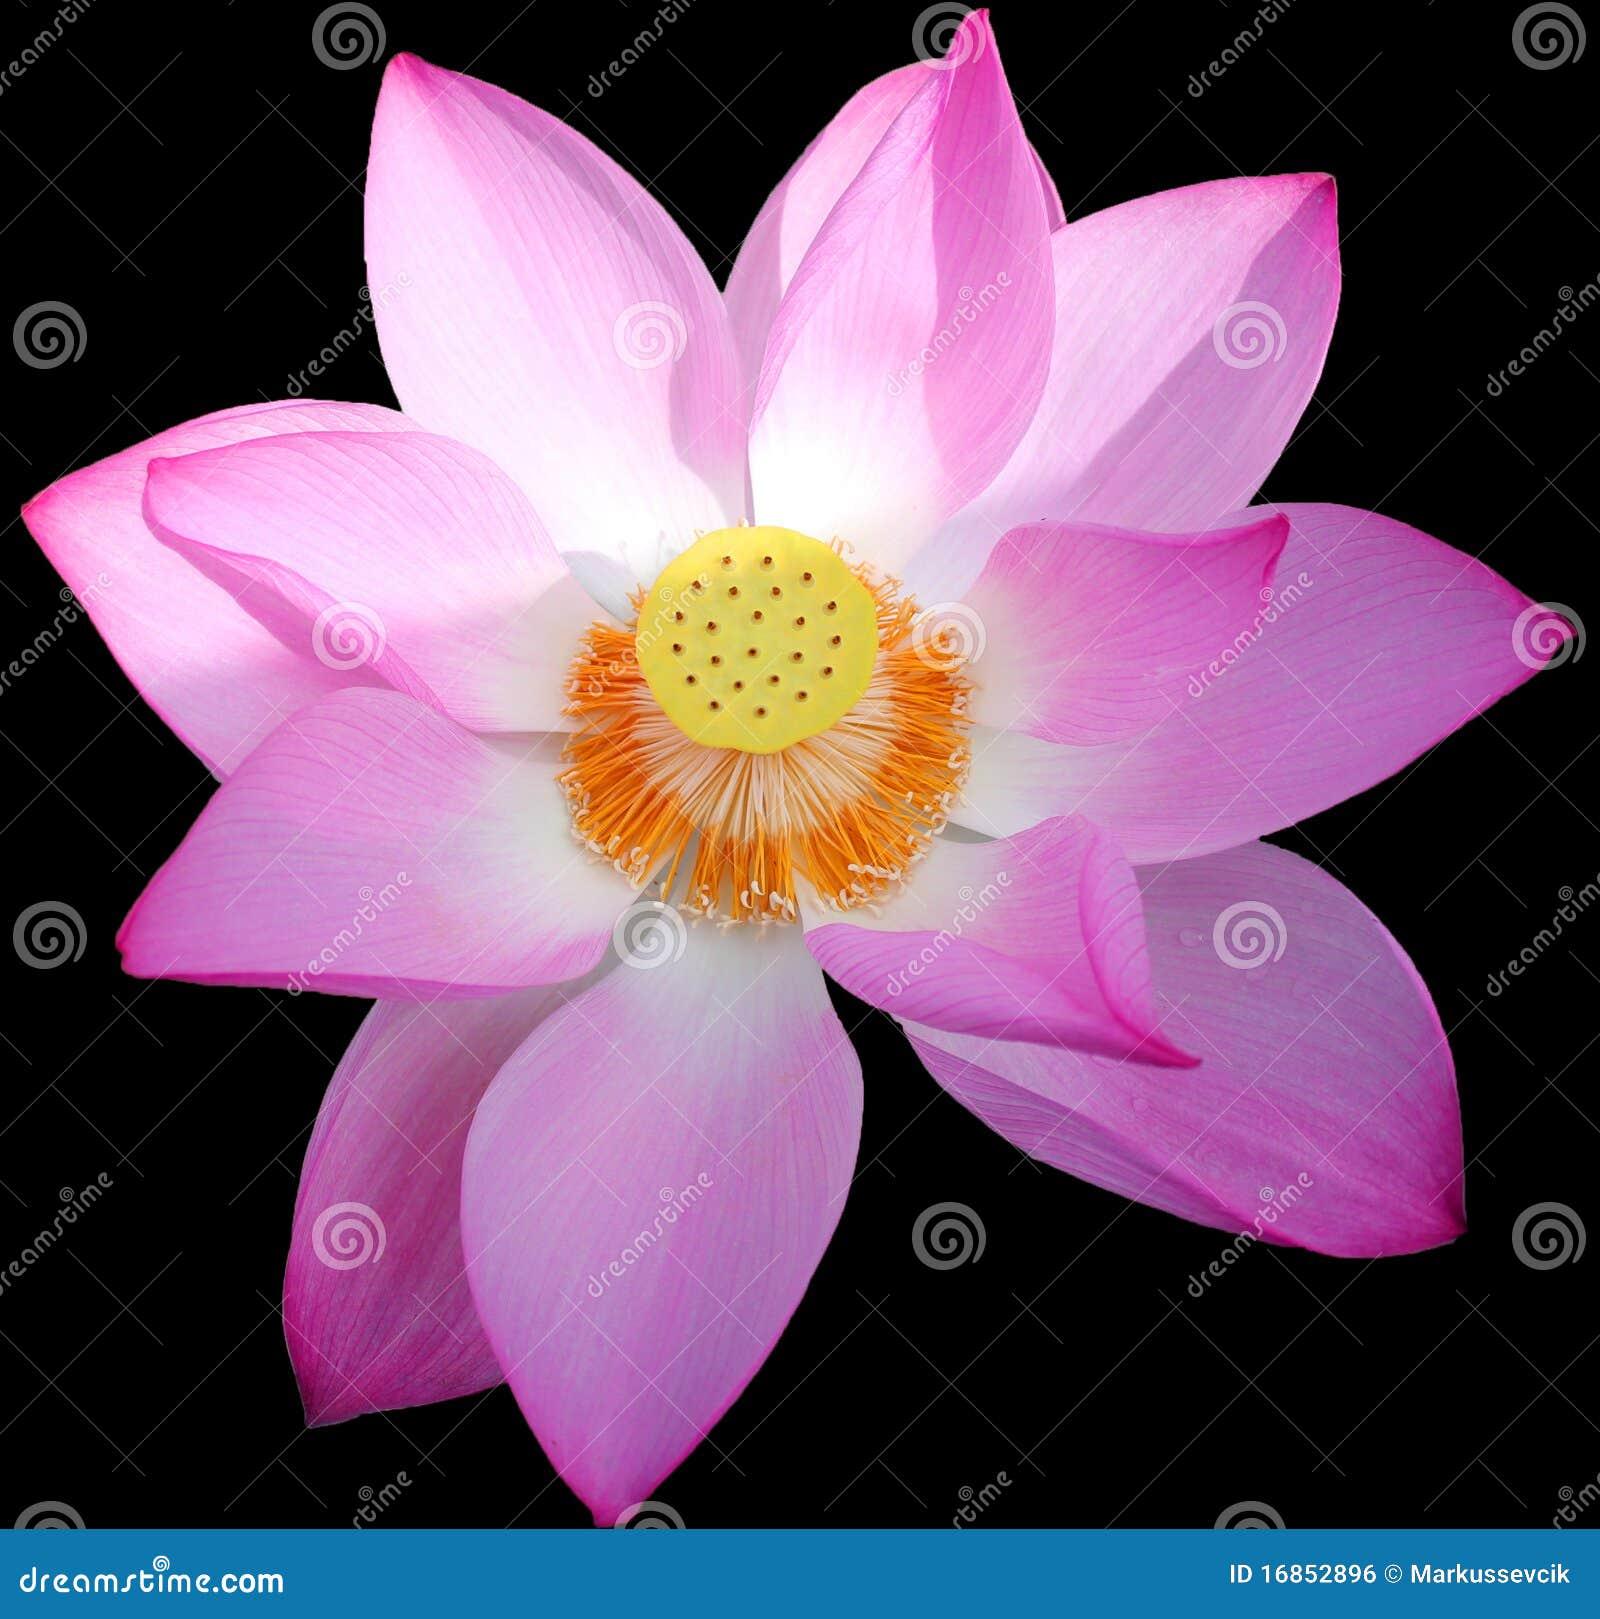 Lotus Flower In China Stock Photo Image Of Beautiful 16852896